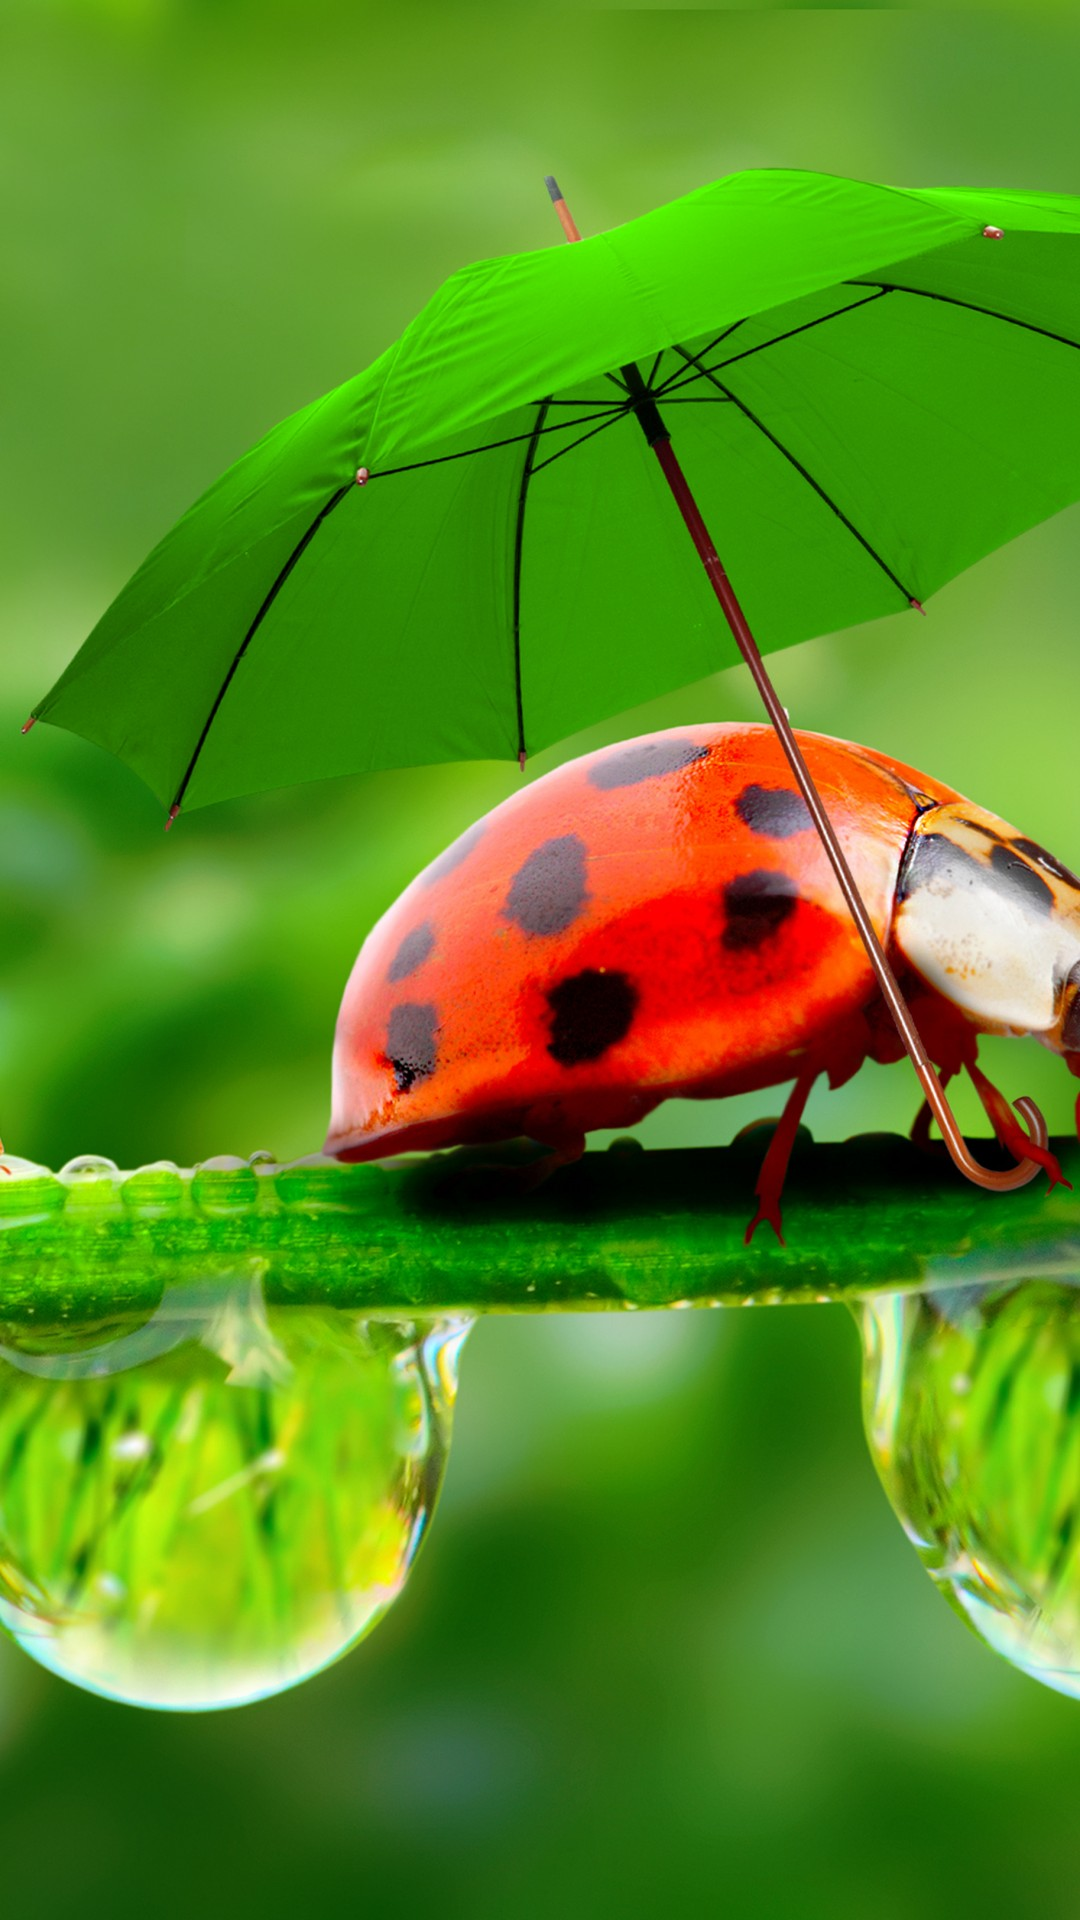 Wallpaper ladybug, red, green, grass, Umbrella, Animals #9967